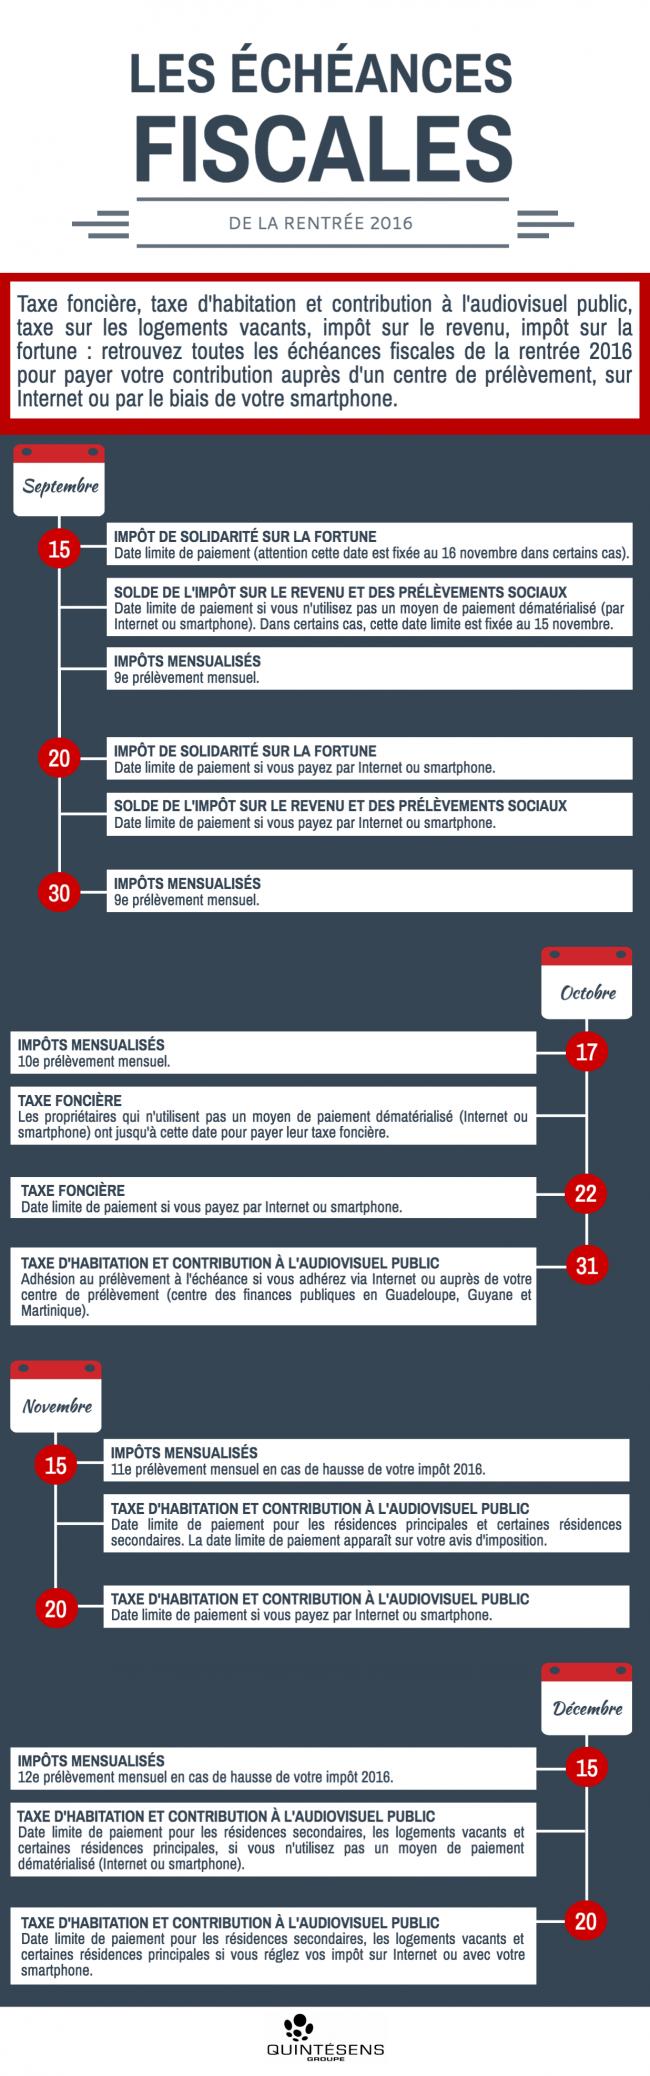 Calendrier Fiscal 2016 Les Echeances De La Rentree